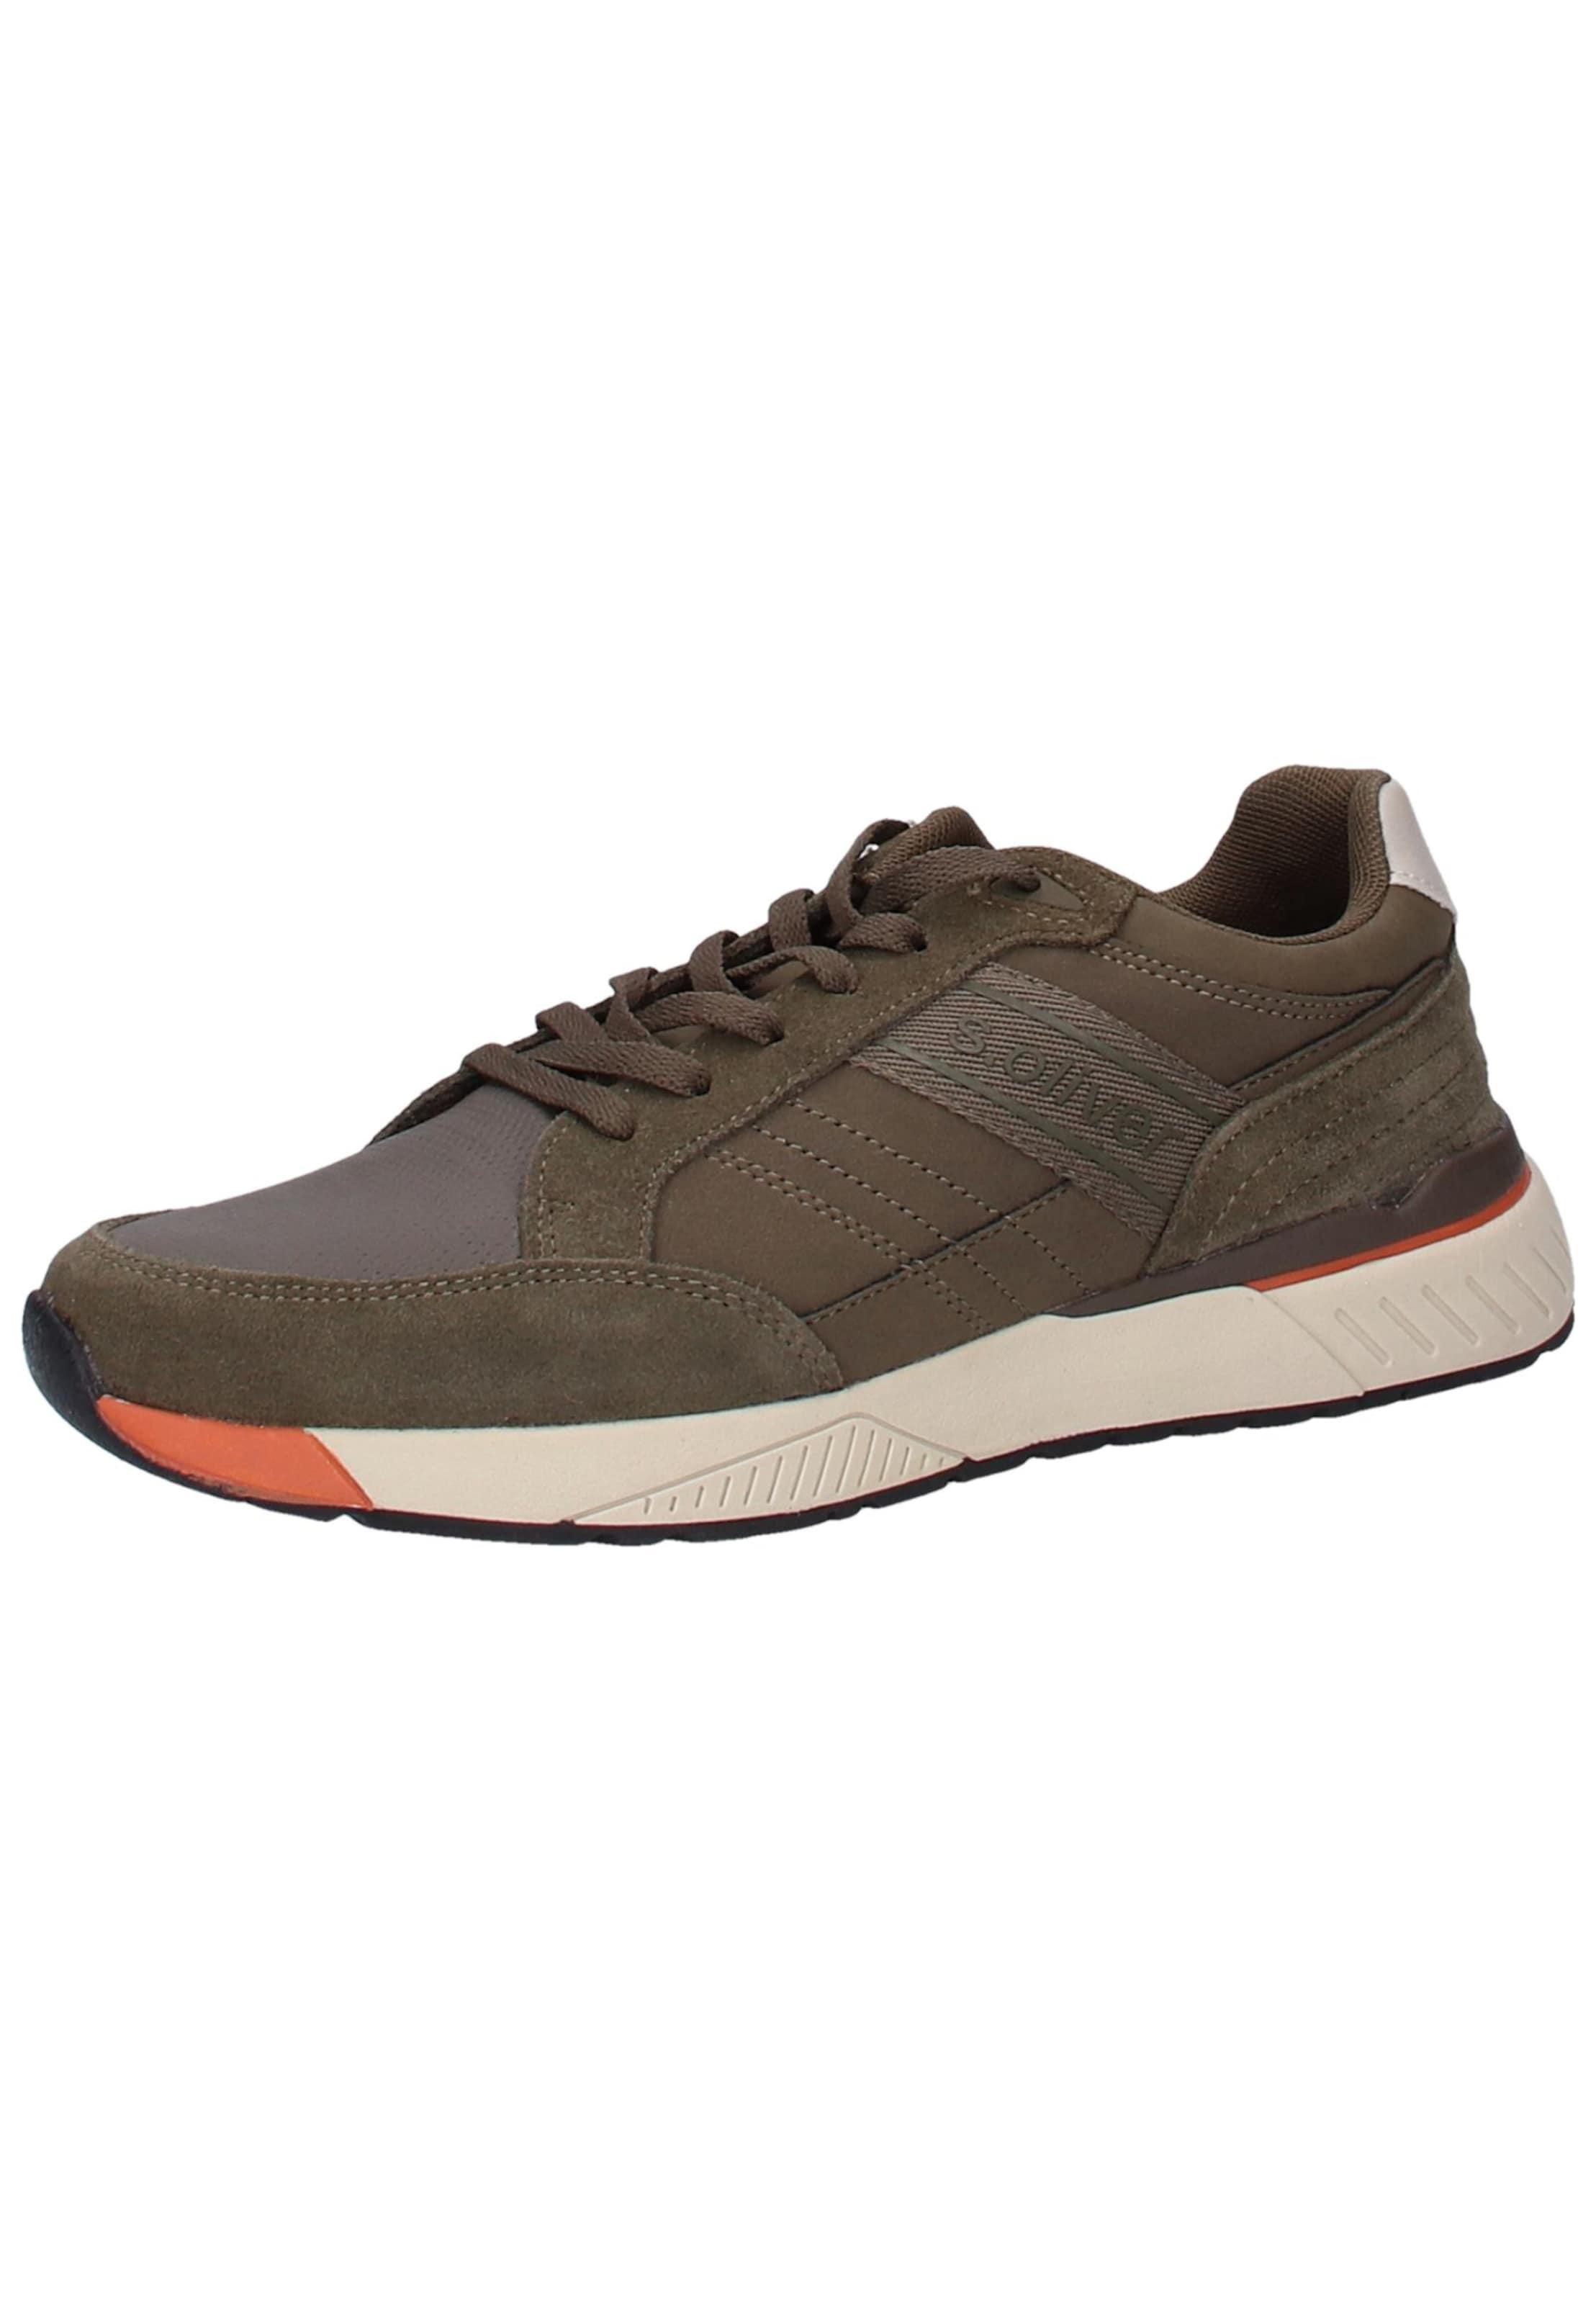 Sneaker Khaki S oliver Label Red In 0XOPN8wZnk